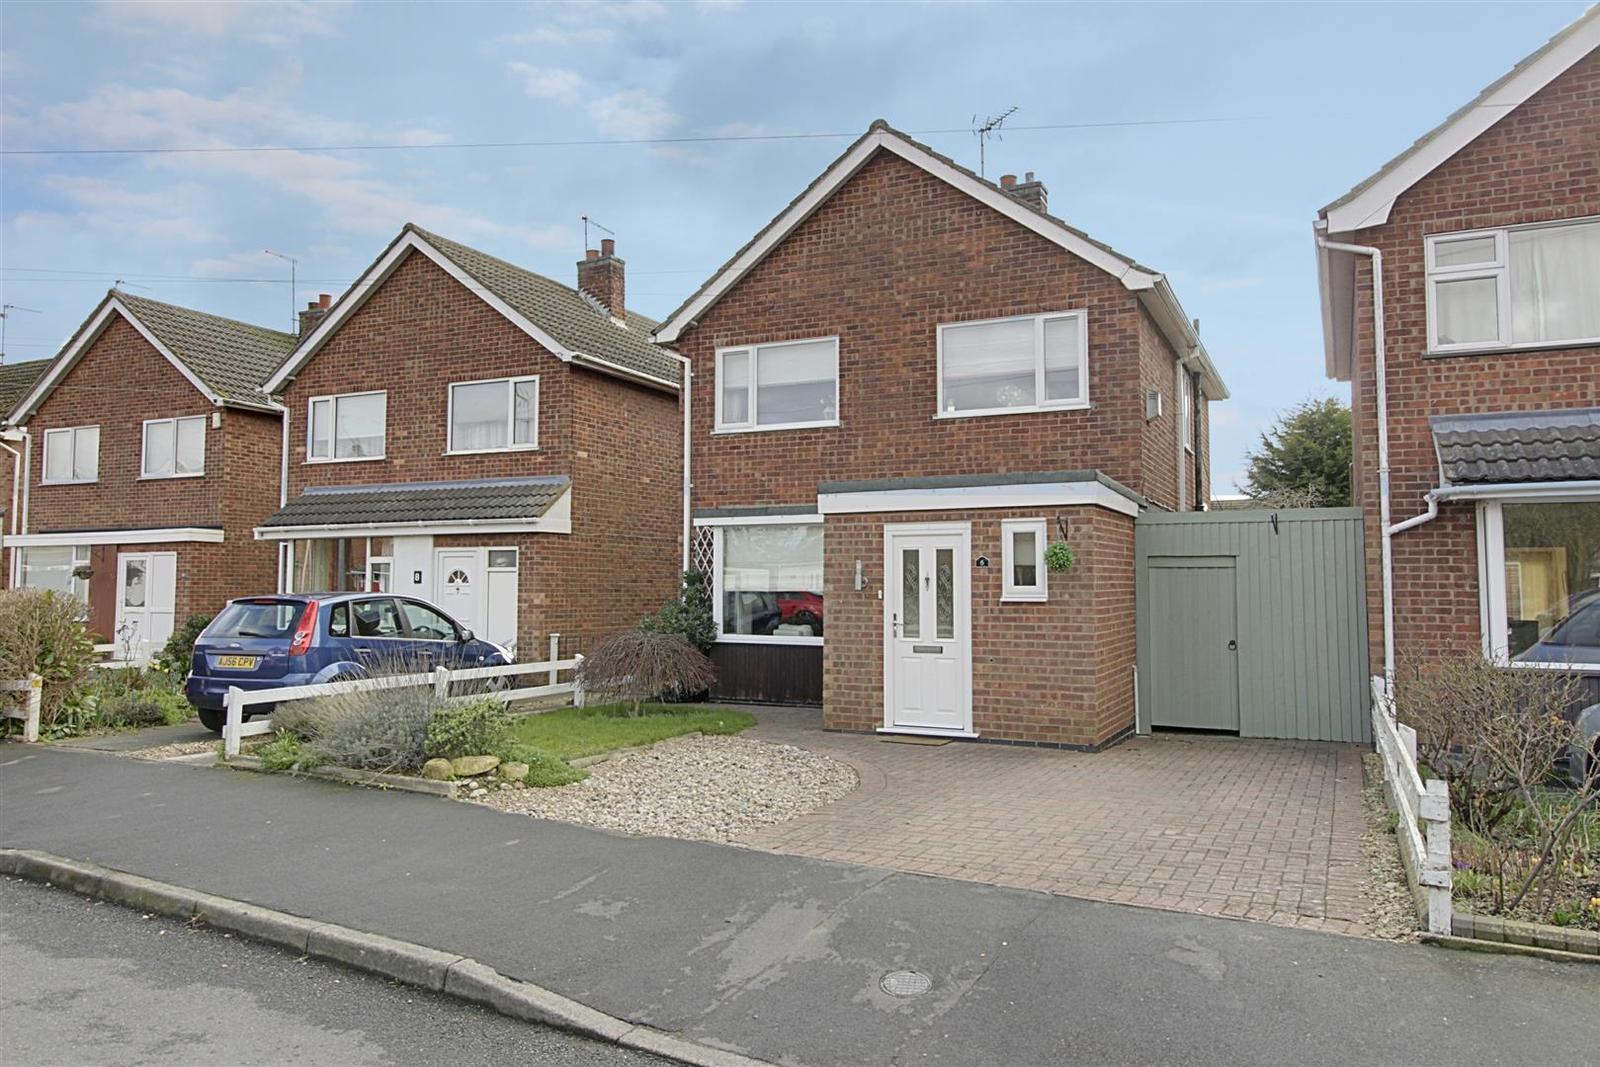 3 Bedrooms Property for sale in 6 Elm Crescent, Glinton